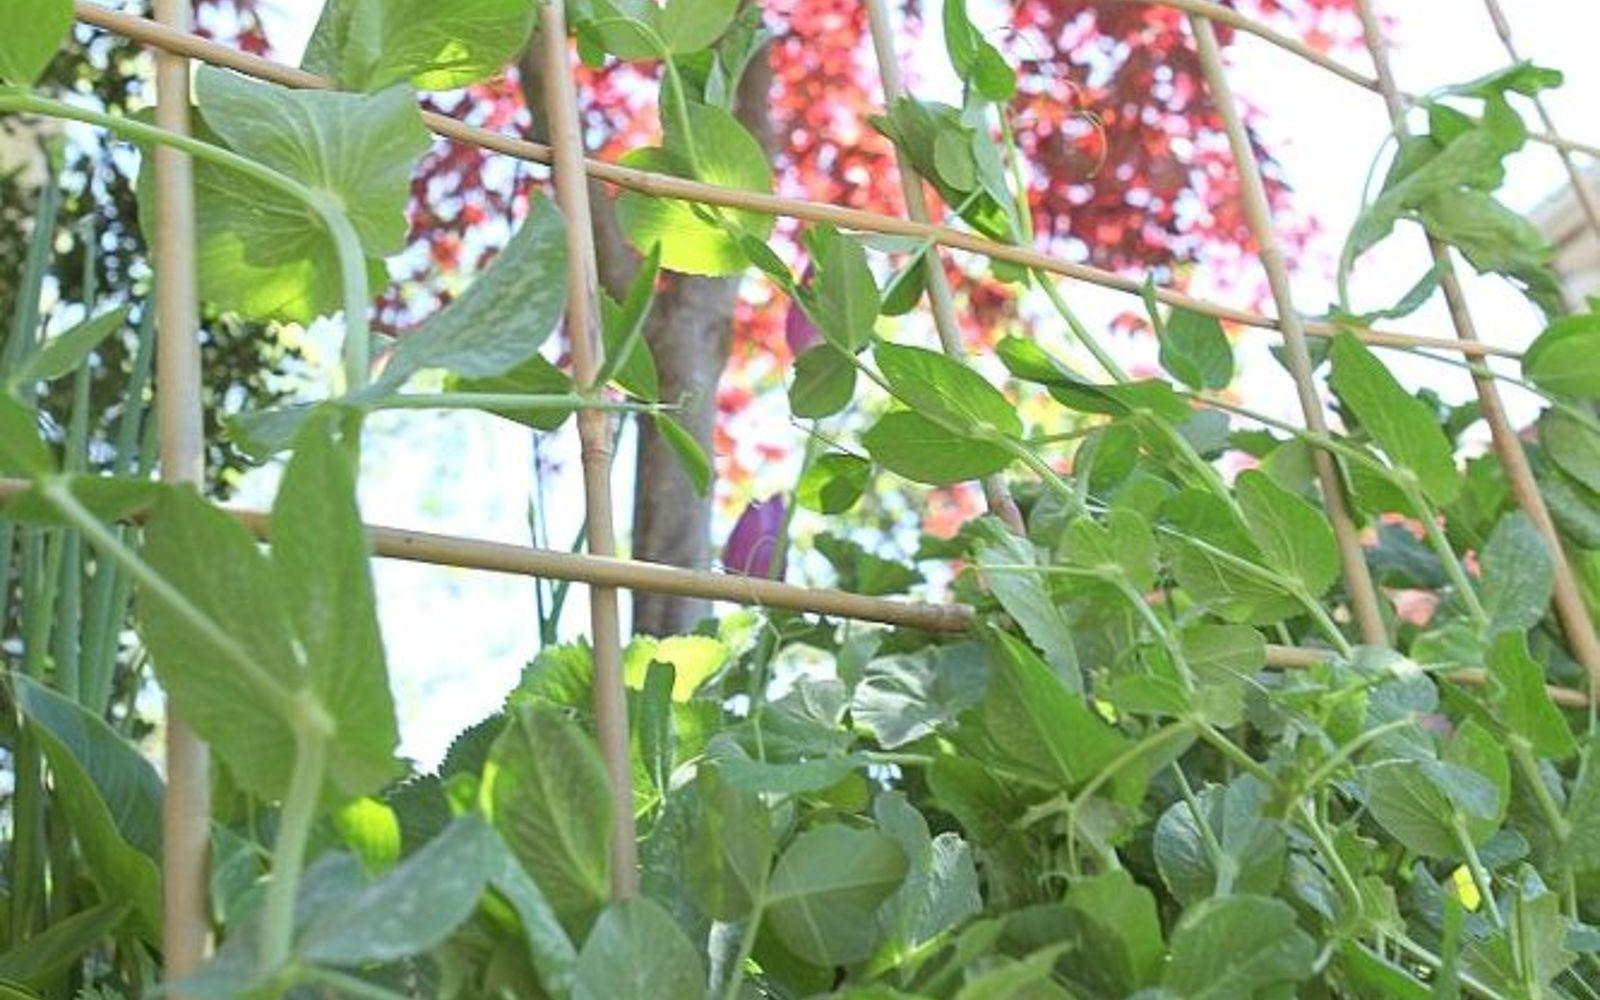 s 17 ways to build a gorgeous garden trellis this summer, gardening, Weave bamboo stakes into a gentle trellis